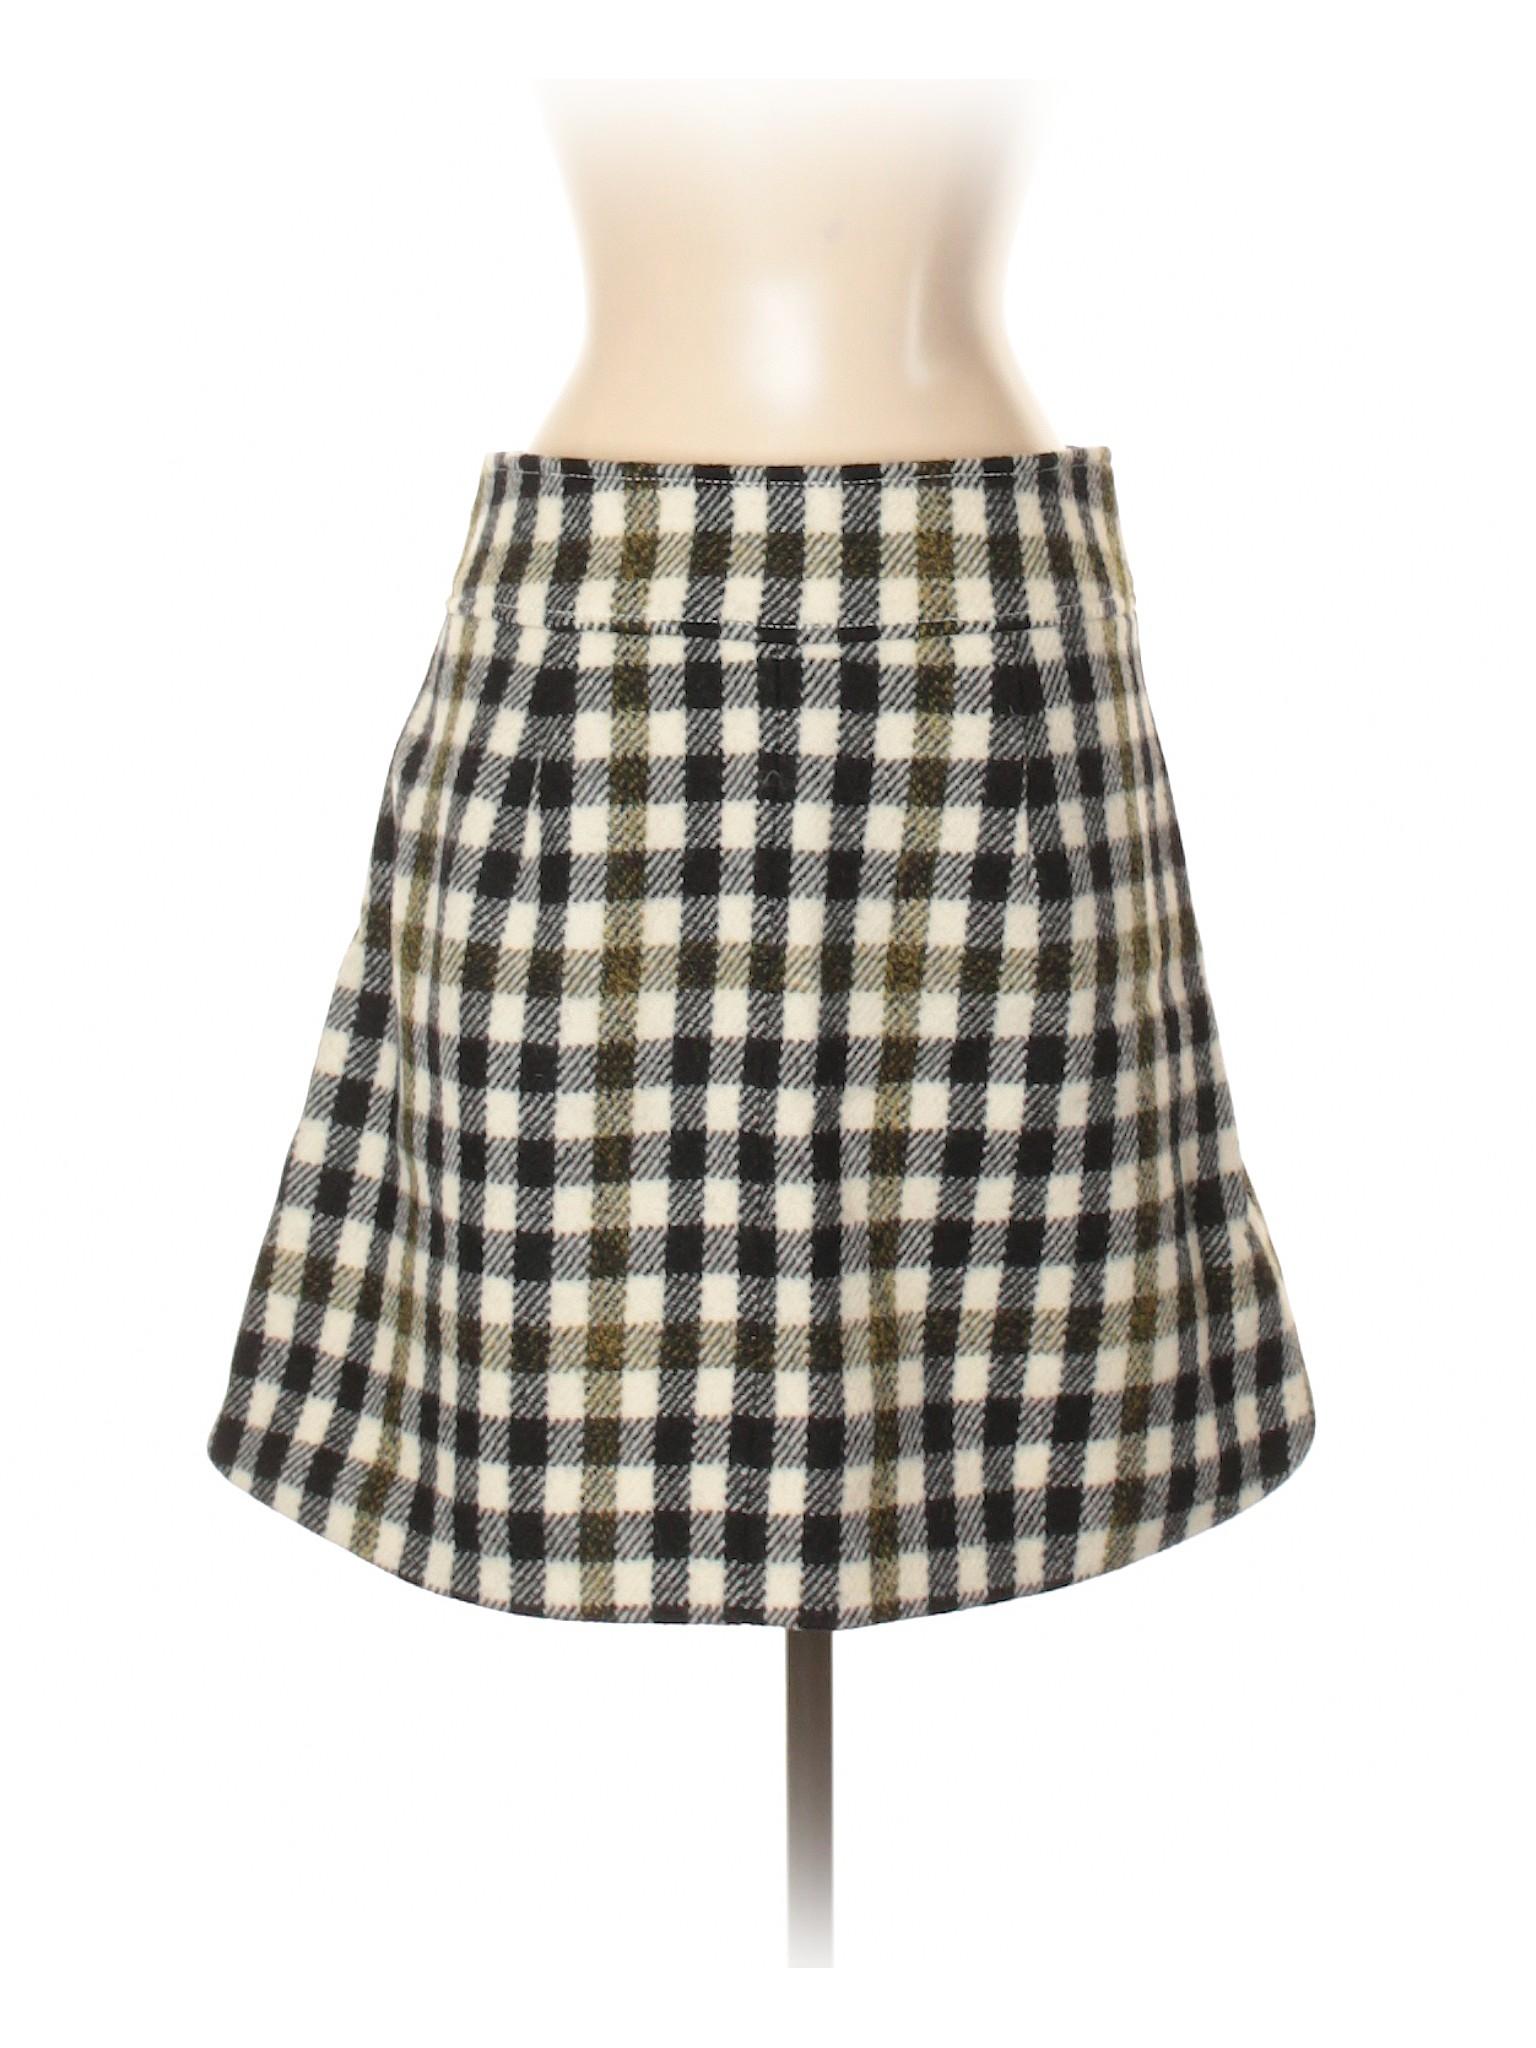 Boutique Skirt Wool Boutique Skirt Boutique Wool P67gOP